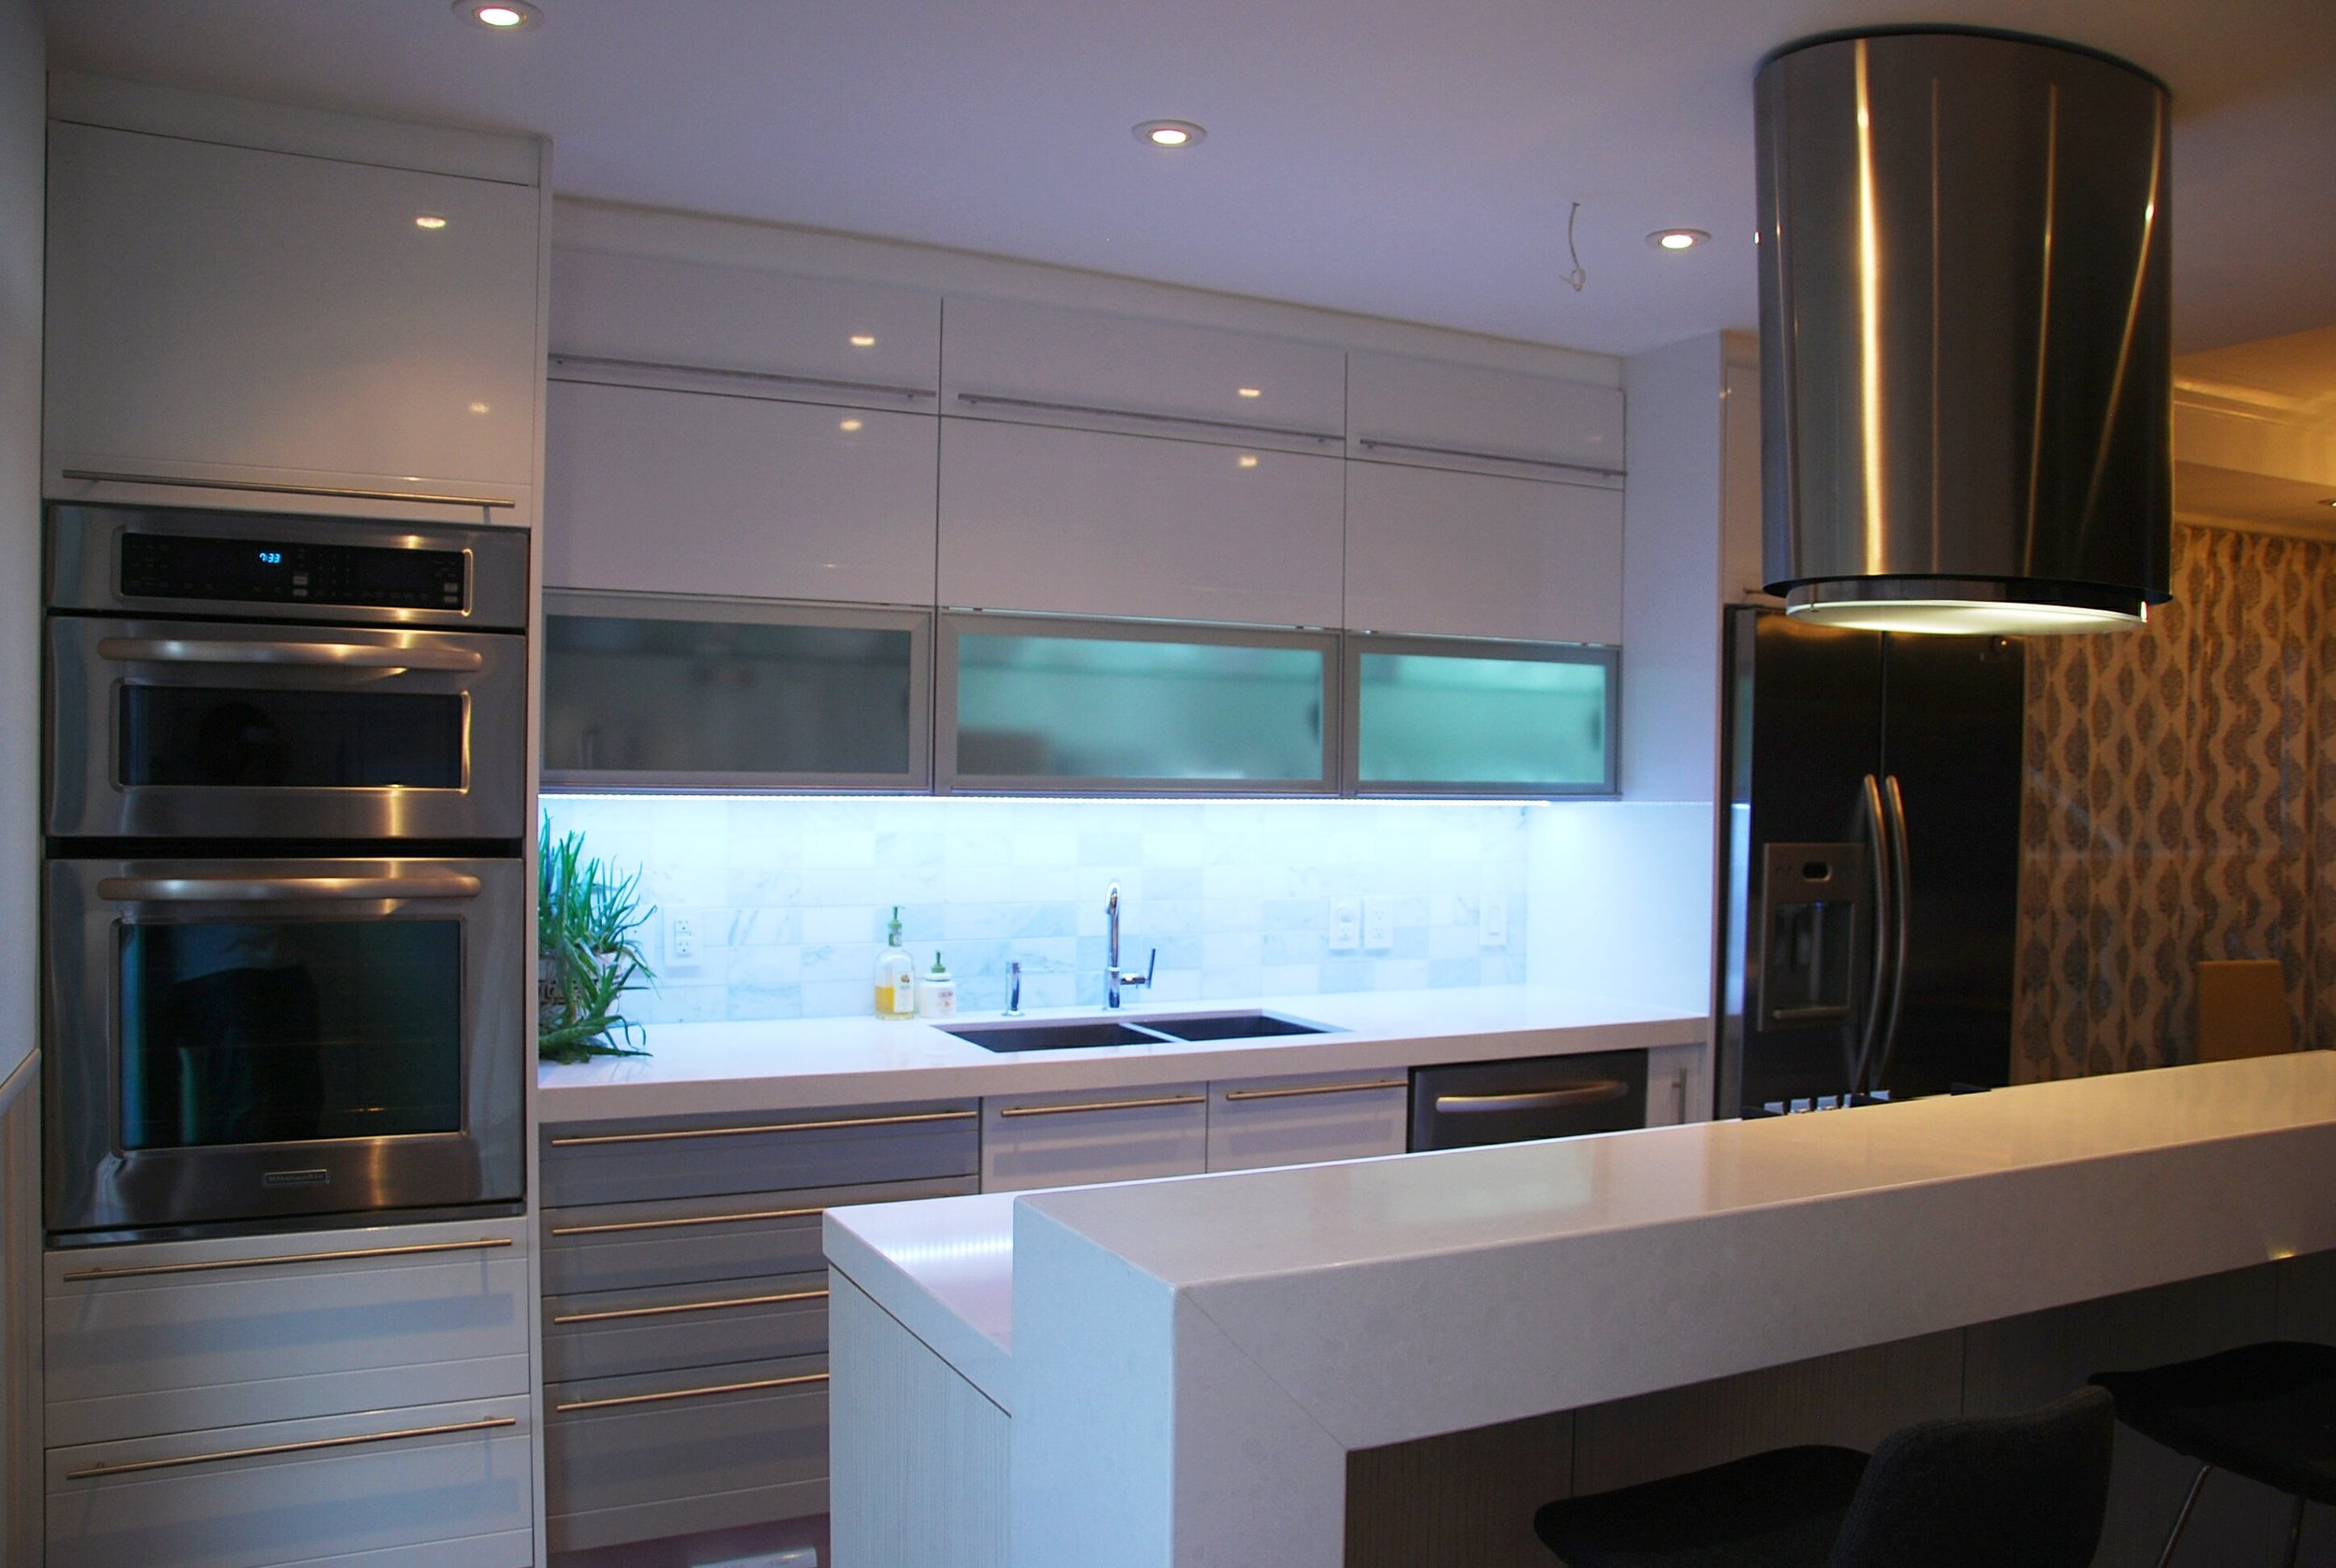 Kitchen 14 Pic 2.jpg